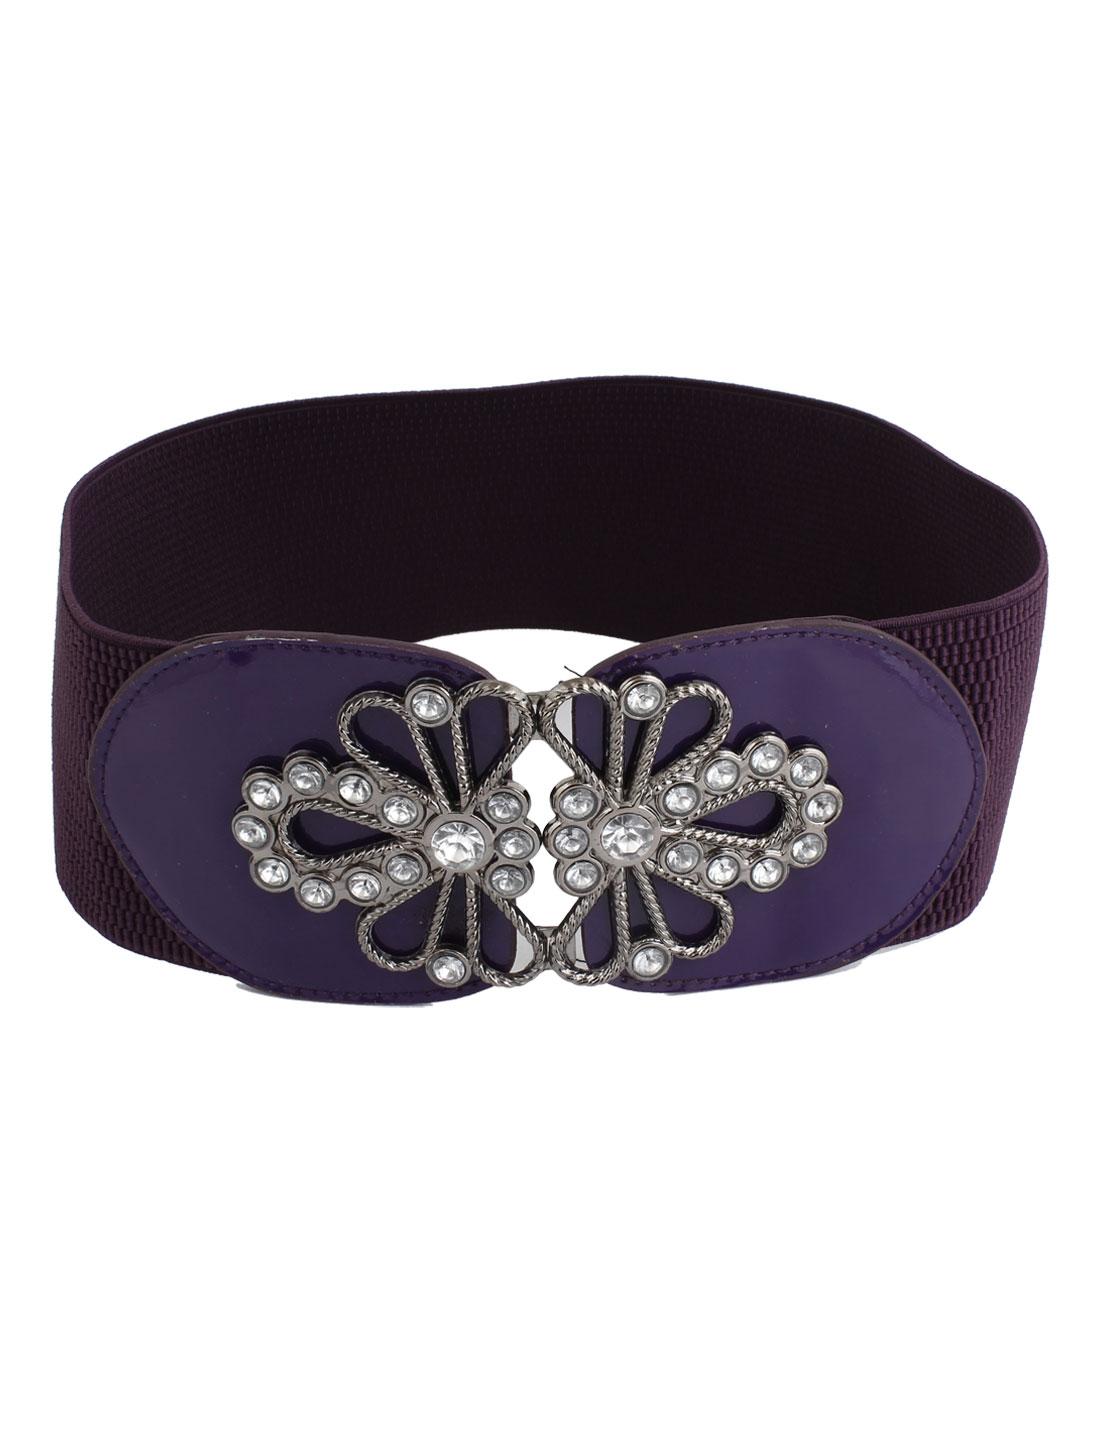 Women Faux Crystals Interlocking Buckle 7cm Wide Stretchy Waist Belt Band Purple